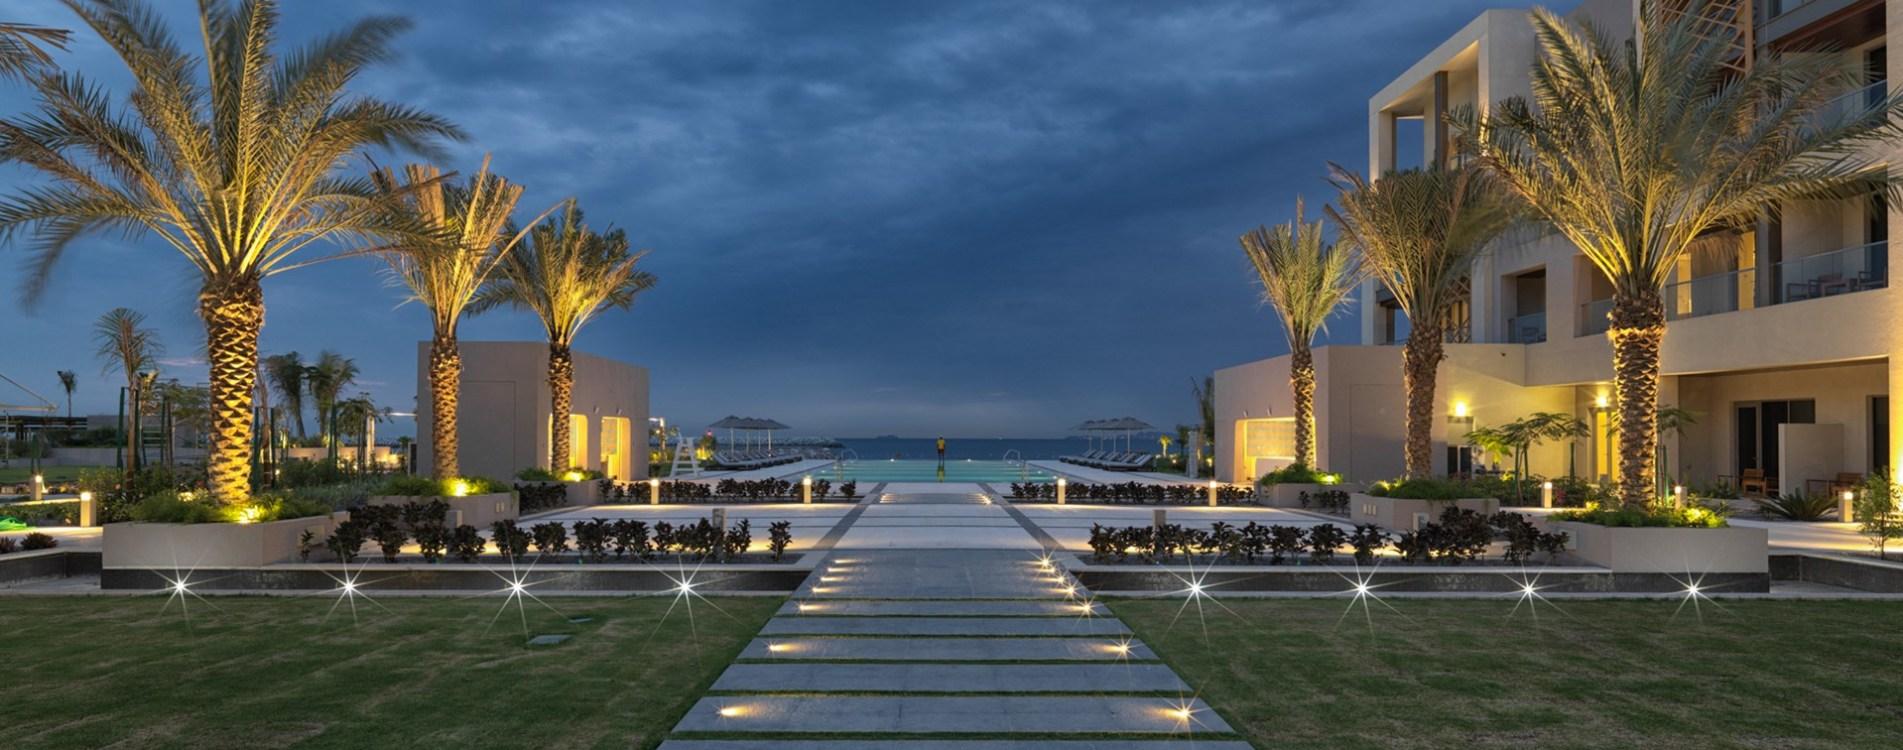 Kempinski-Hotel-Muscat-Courtyard-Oman